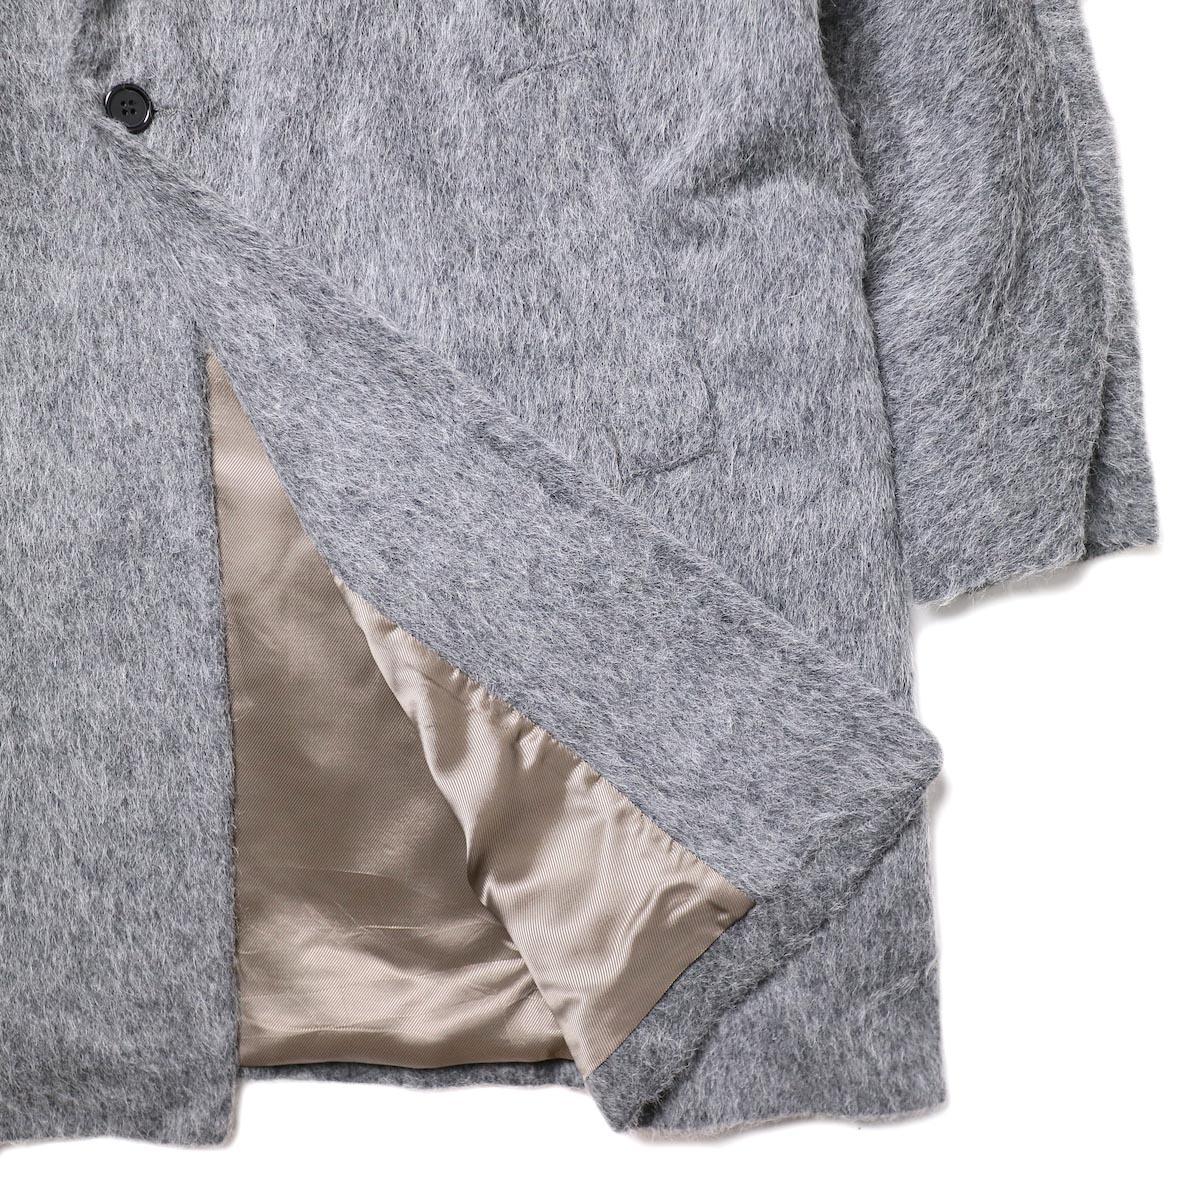 BASISBROEK / RECHT (med grey) 裏地